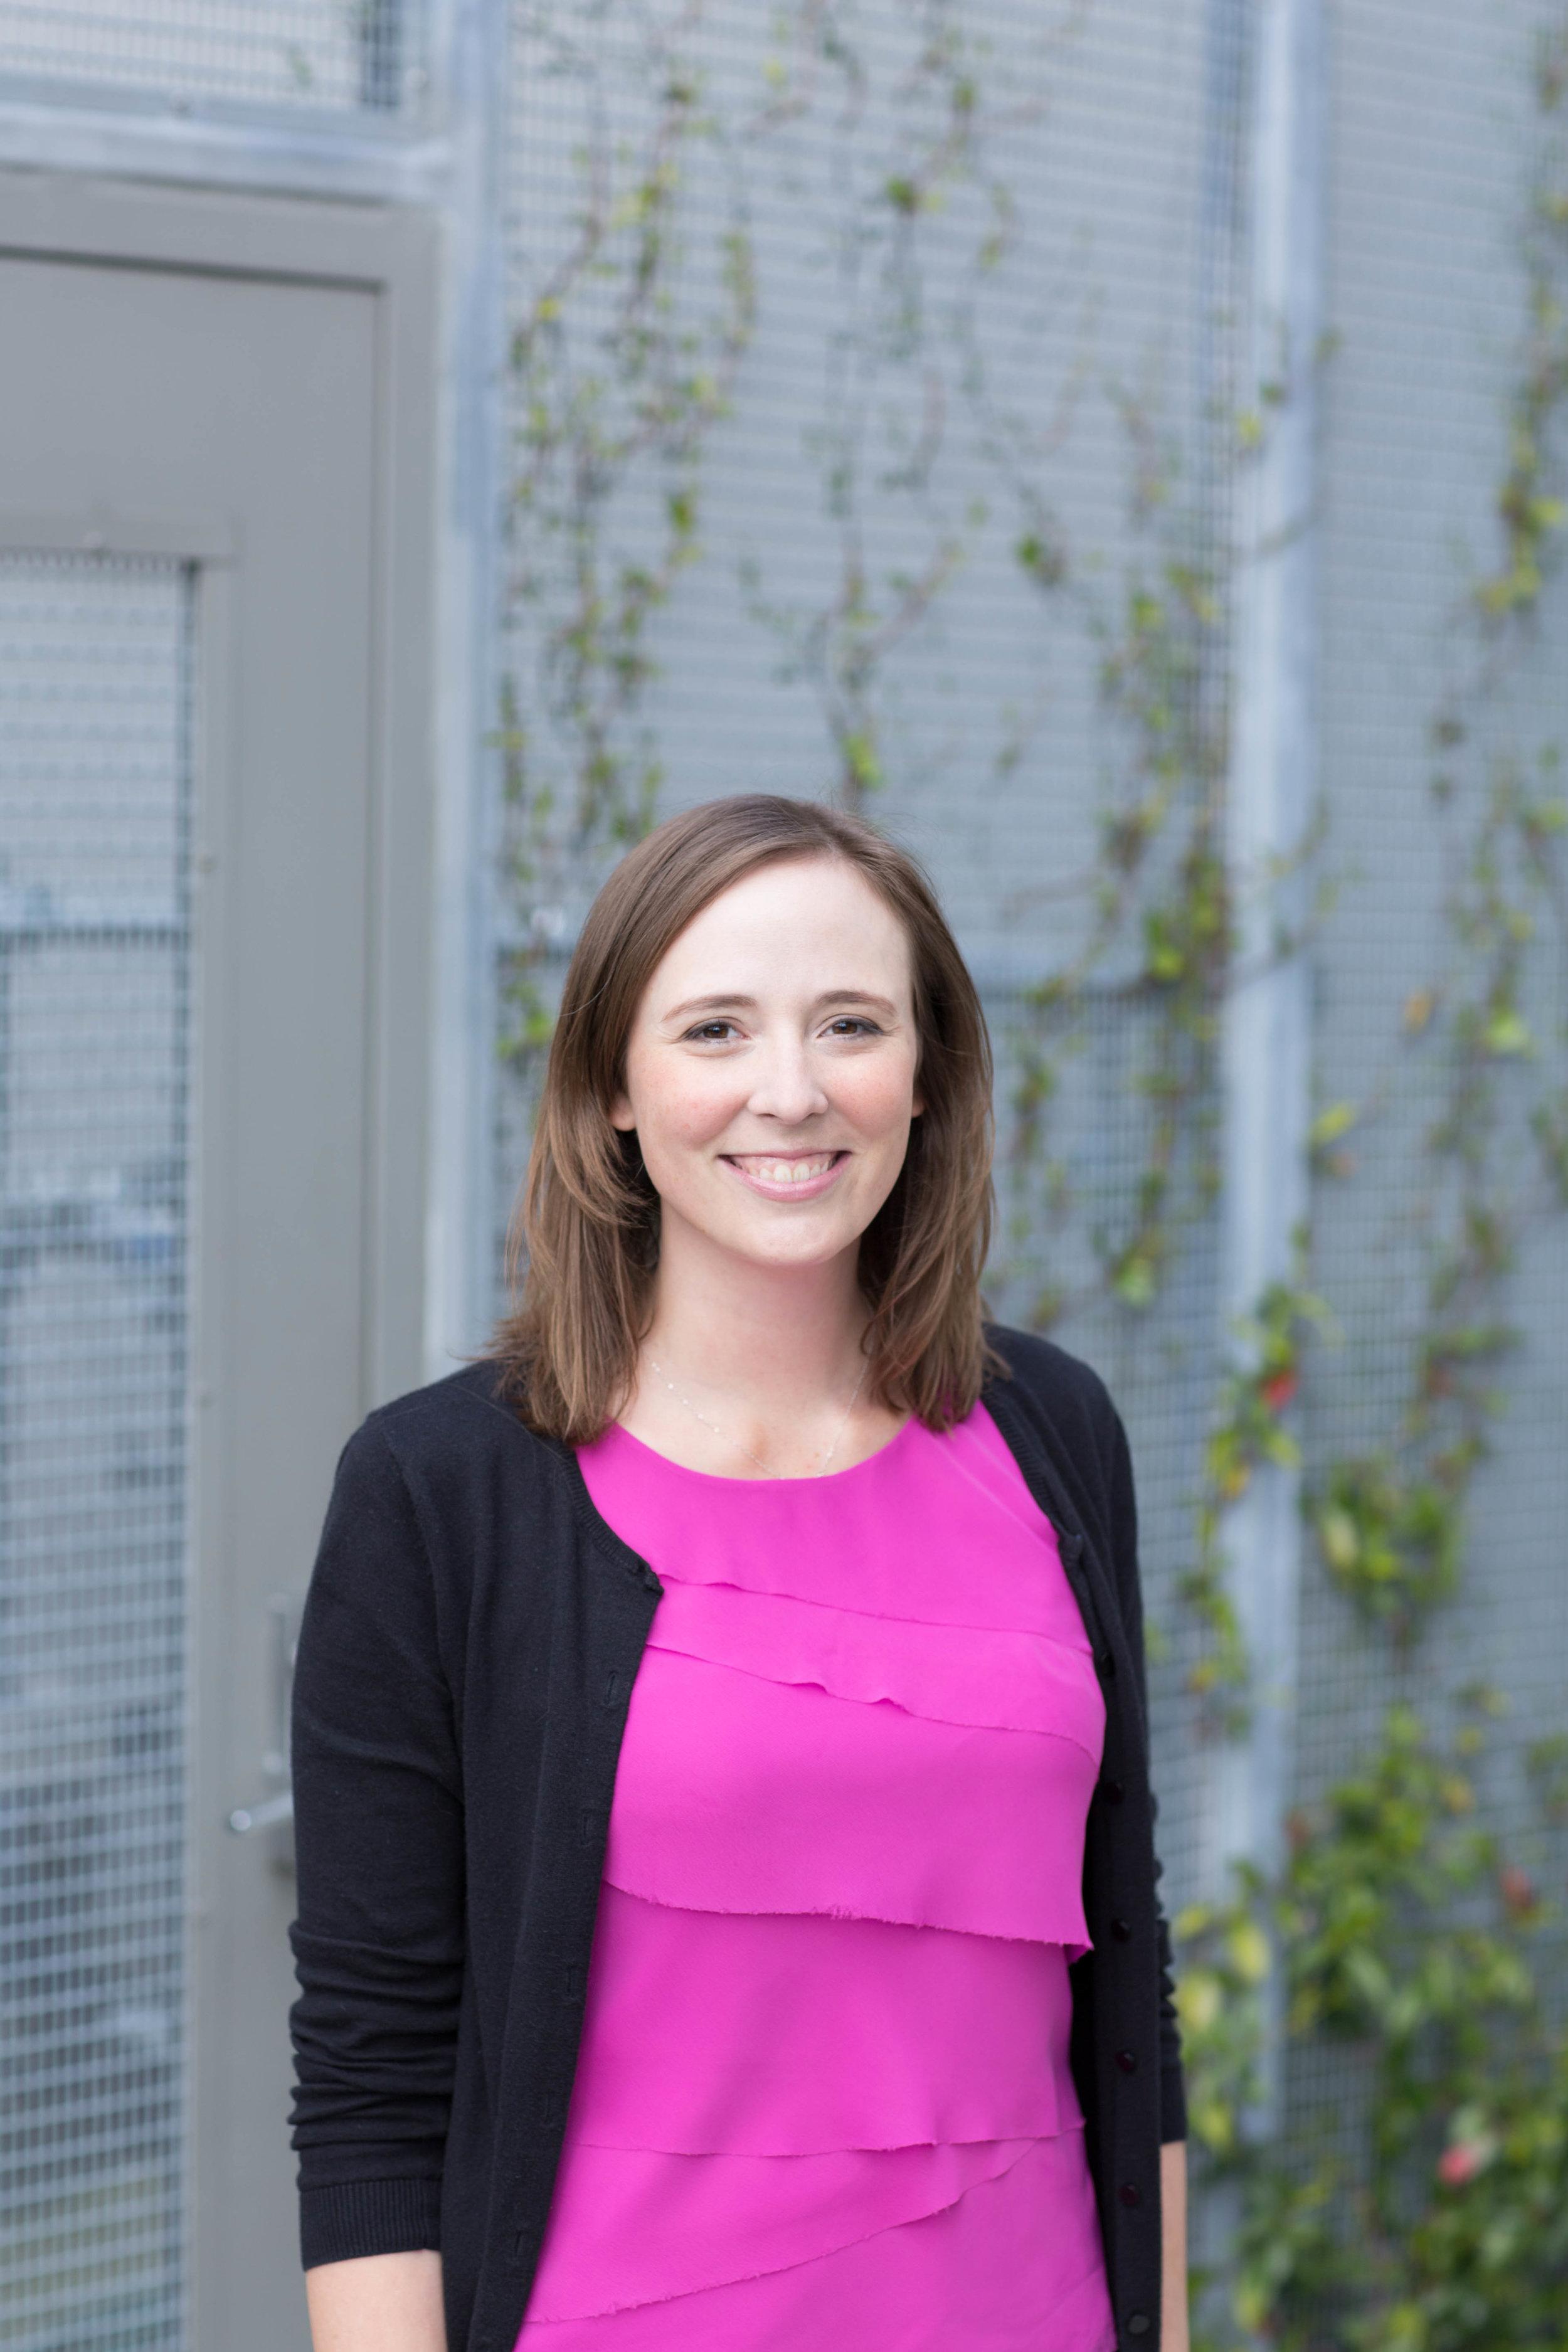 Jess Stetson